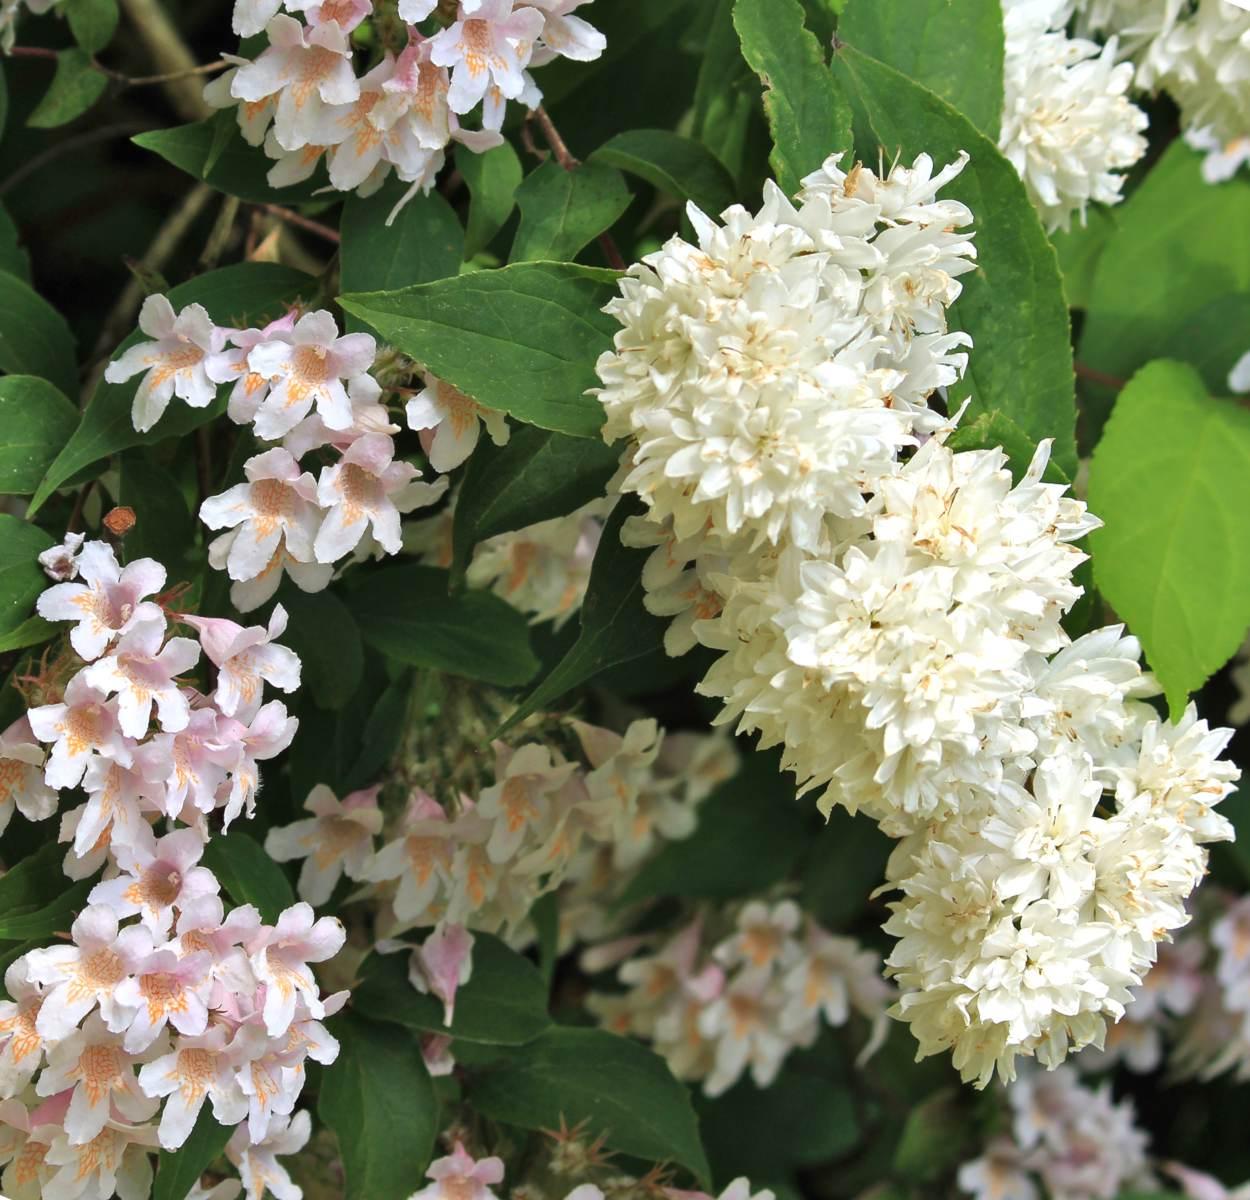 Two varieties of deutzia flowering next to each other.